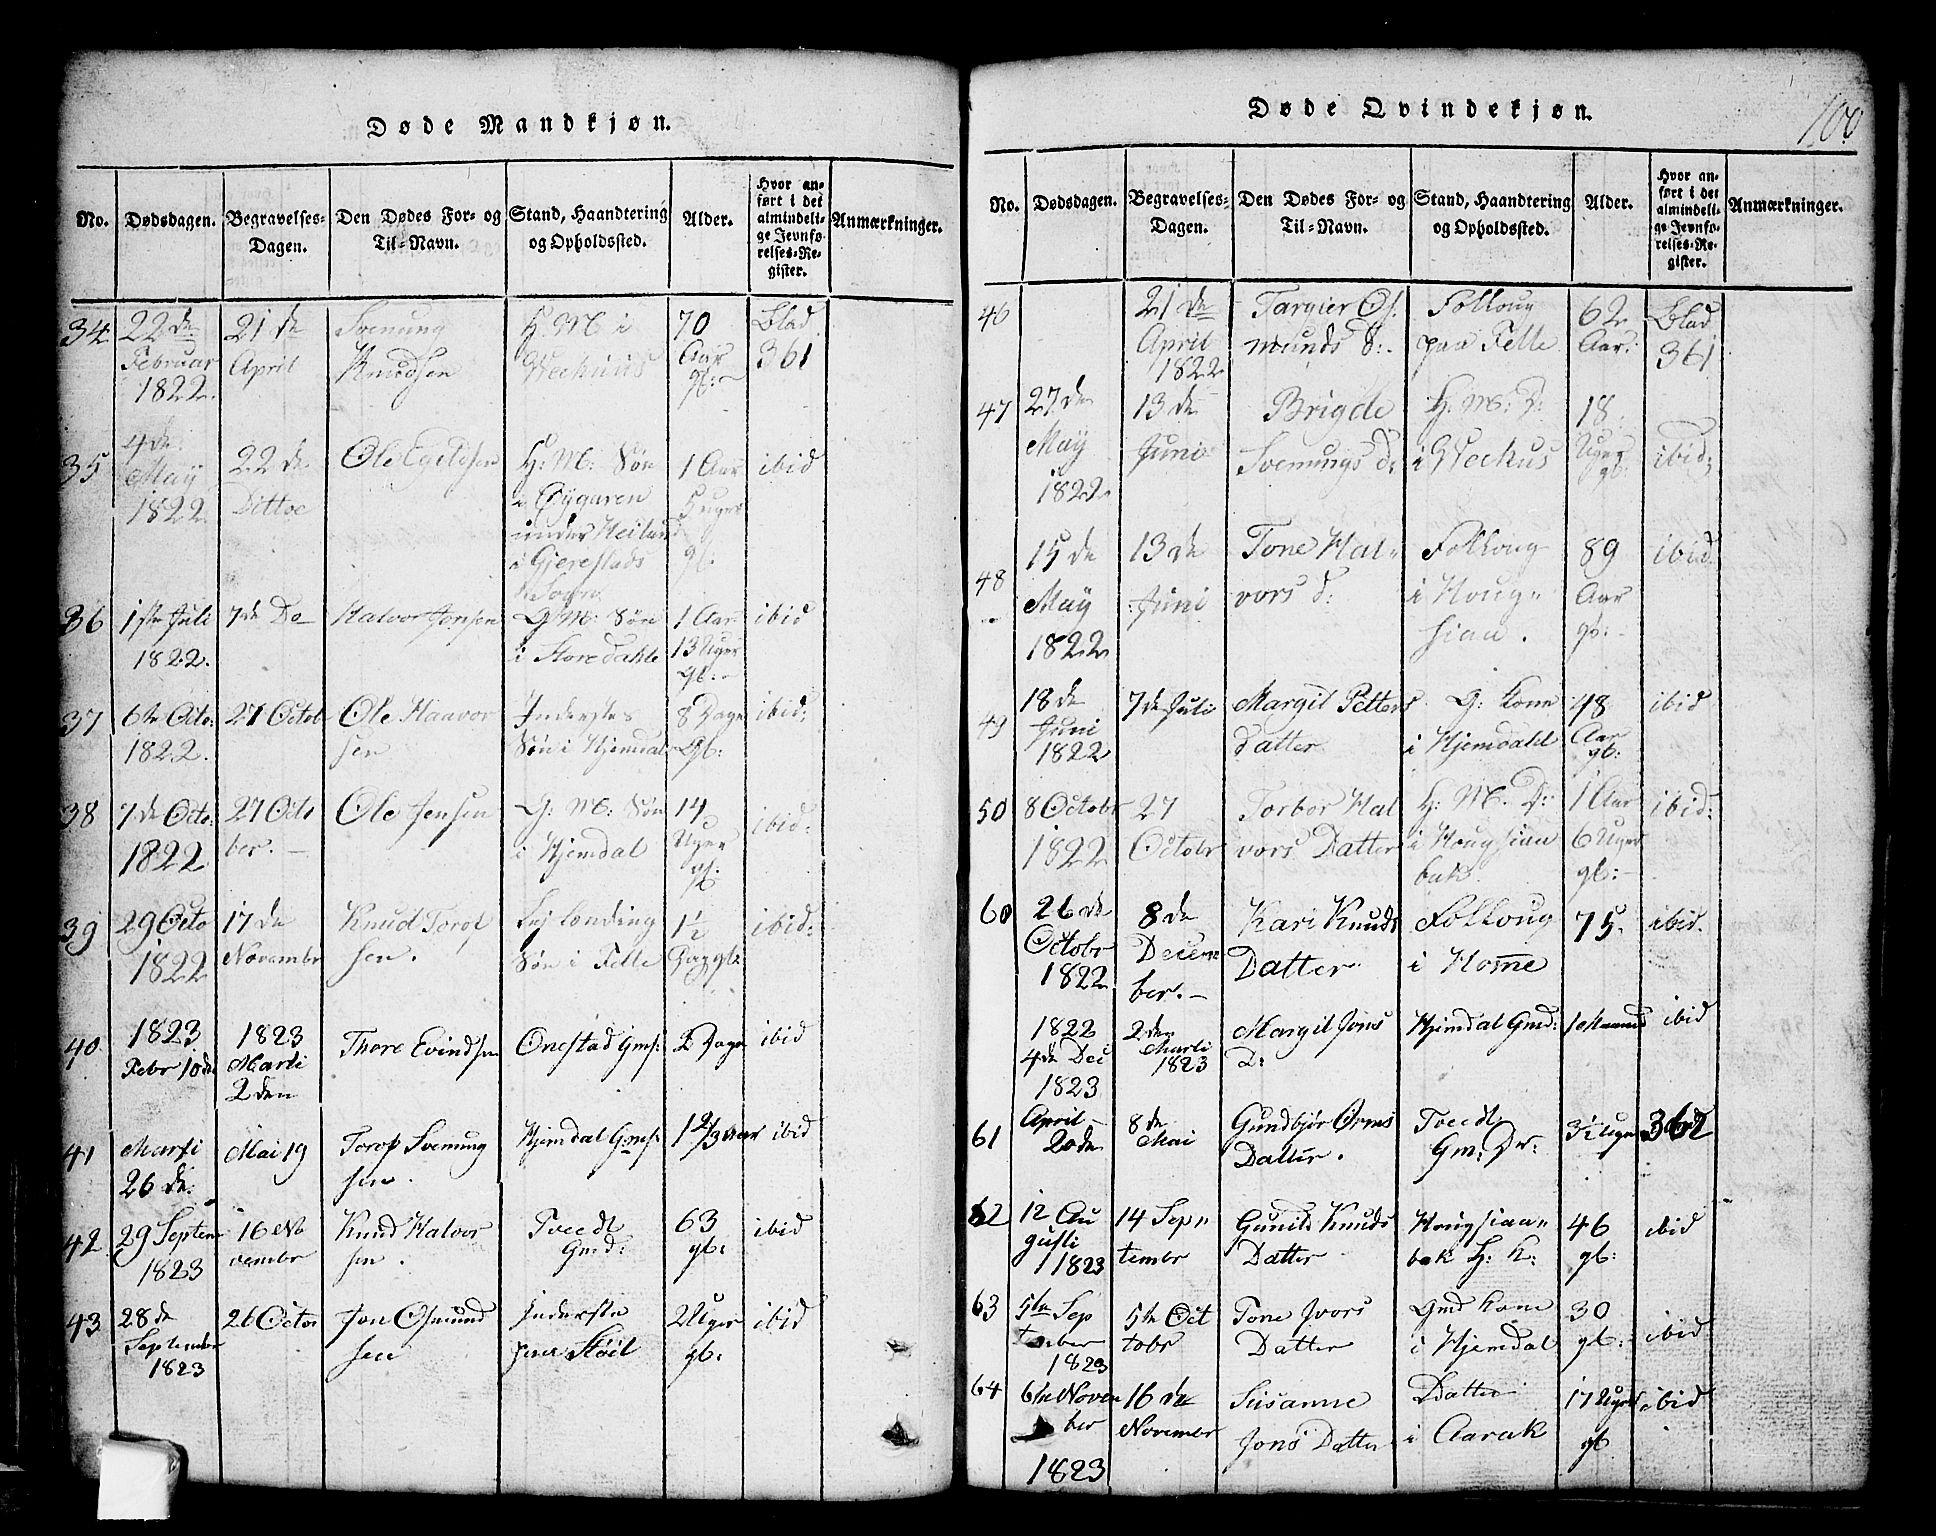 SAKO, Nissedal kirkebøker, G/Gb/L0001: Klokkerbok nr. II 1, 1814-1862, s. 100